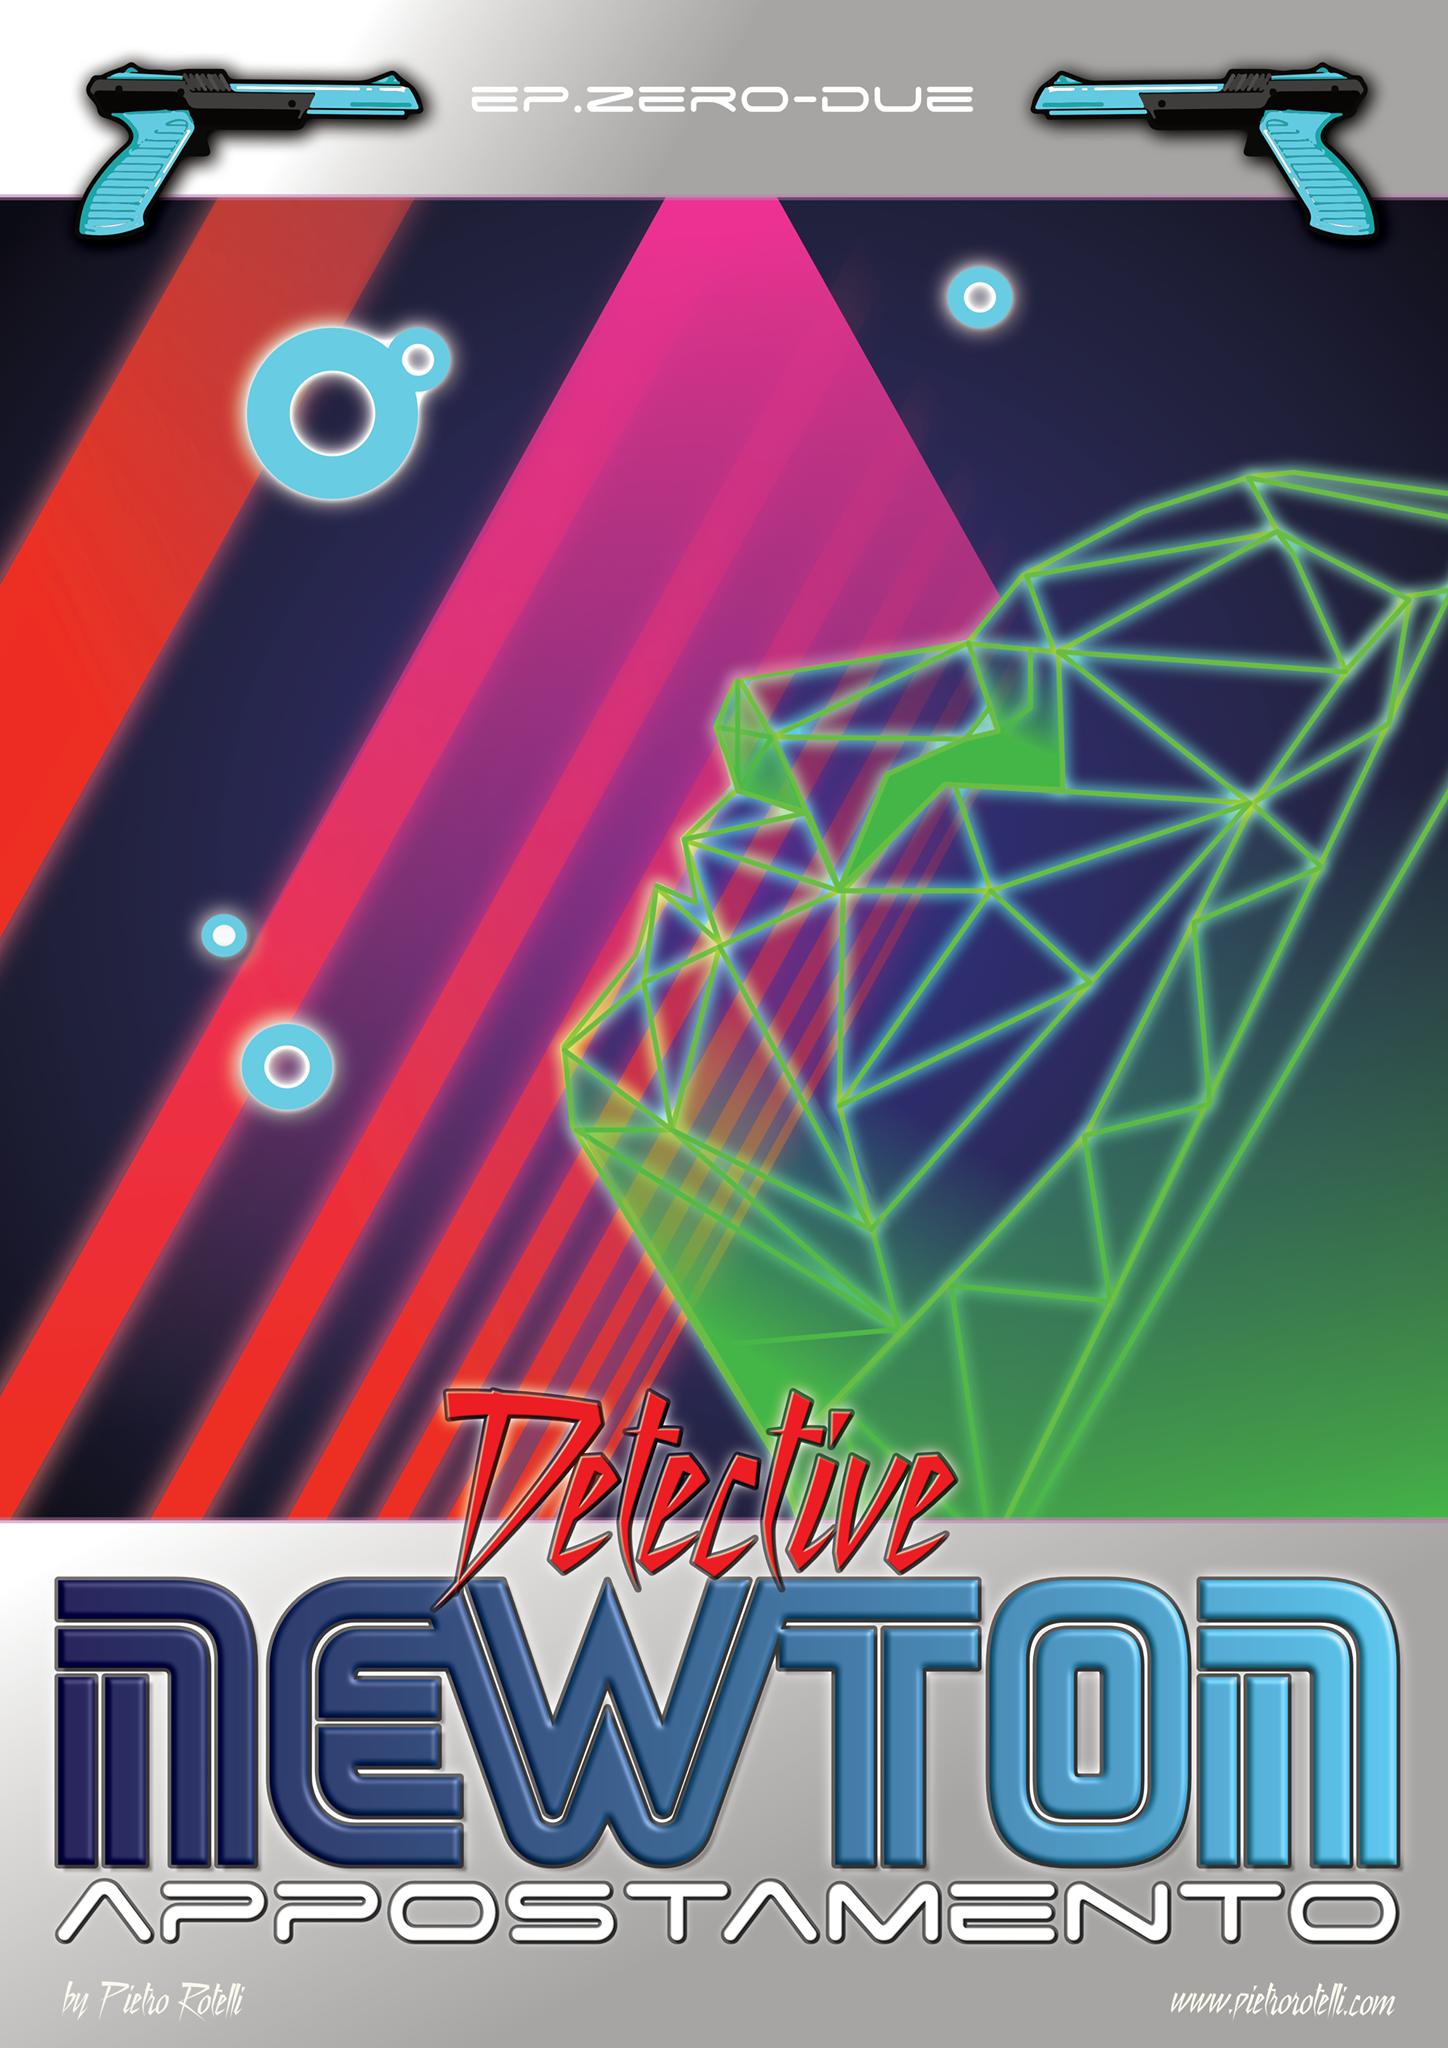 Appostamento (Un'avventura del Detective Newton – EP.02) 5 - fanzine